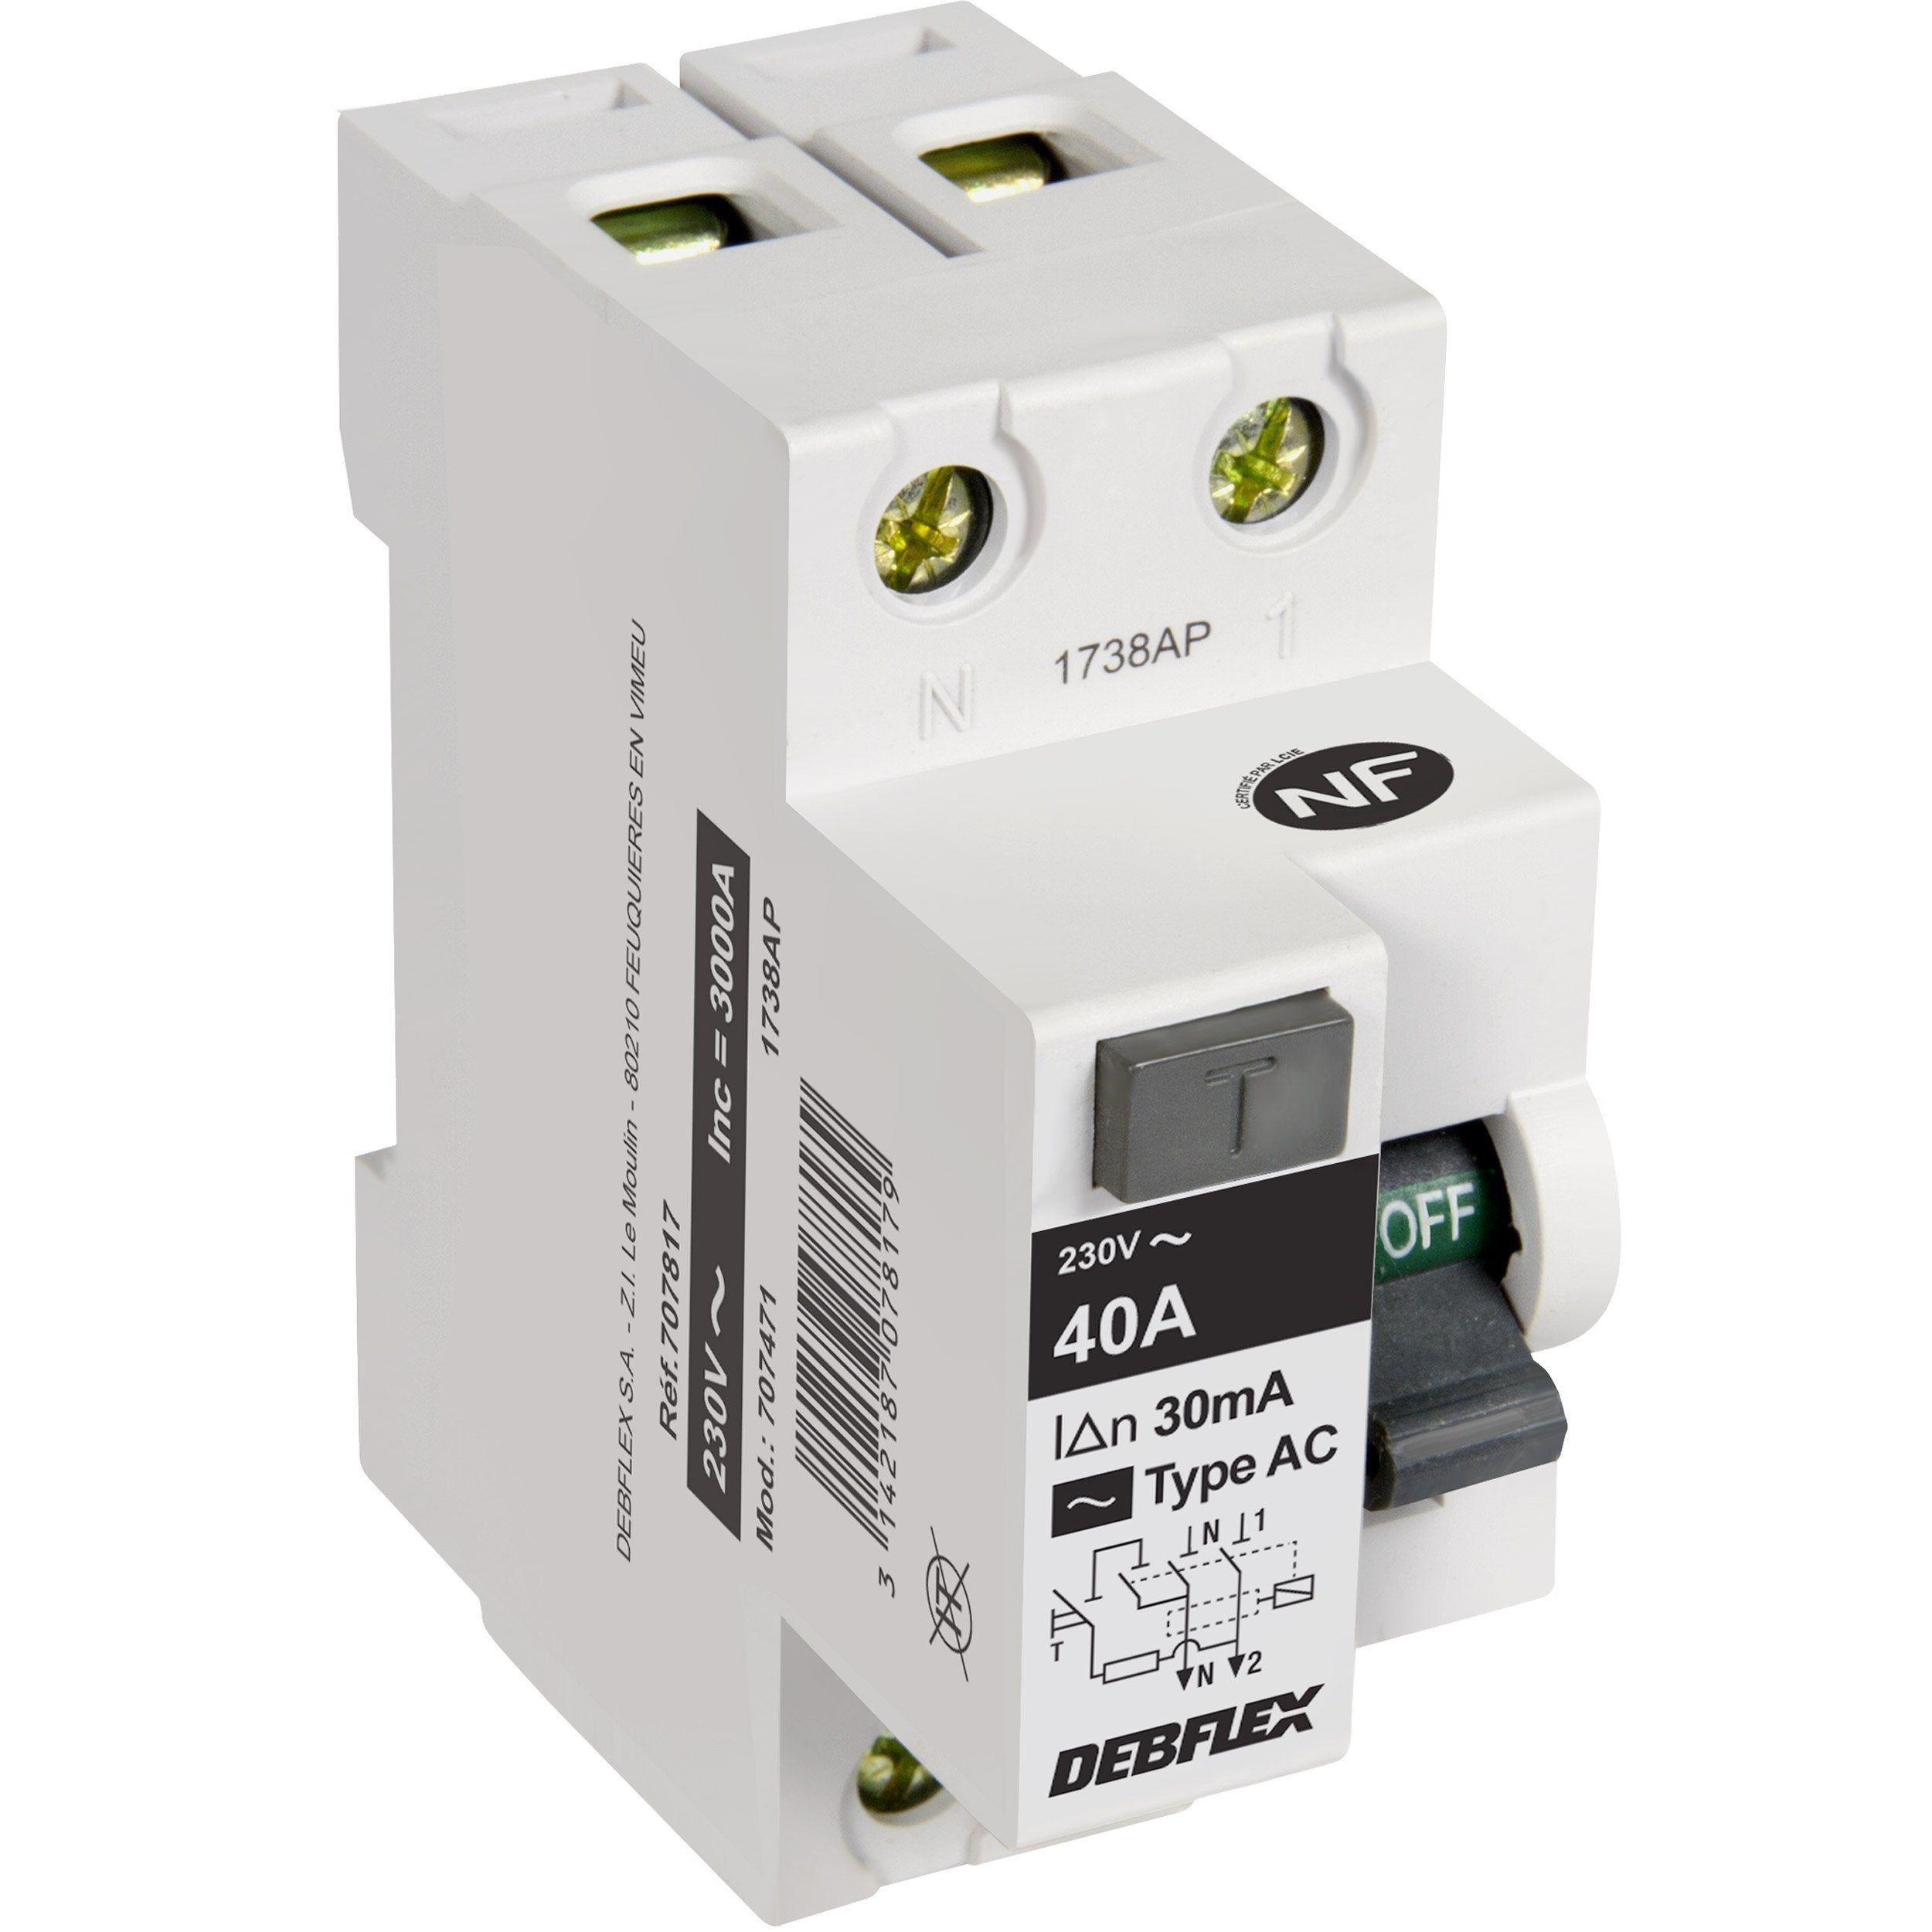 Interrupteur Différentiel Debflex 30 Ma 40 A Ac